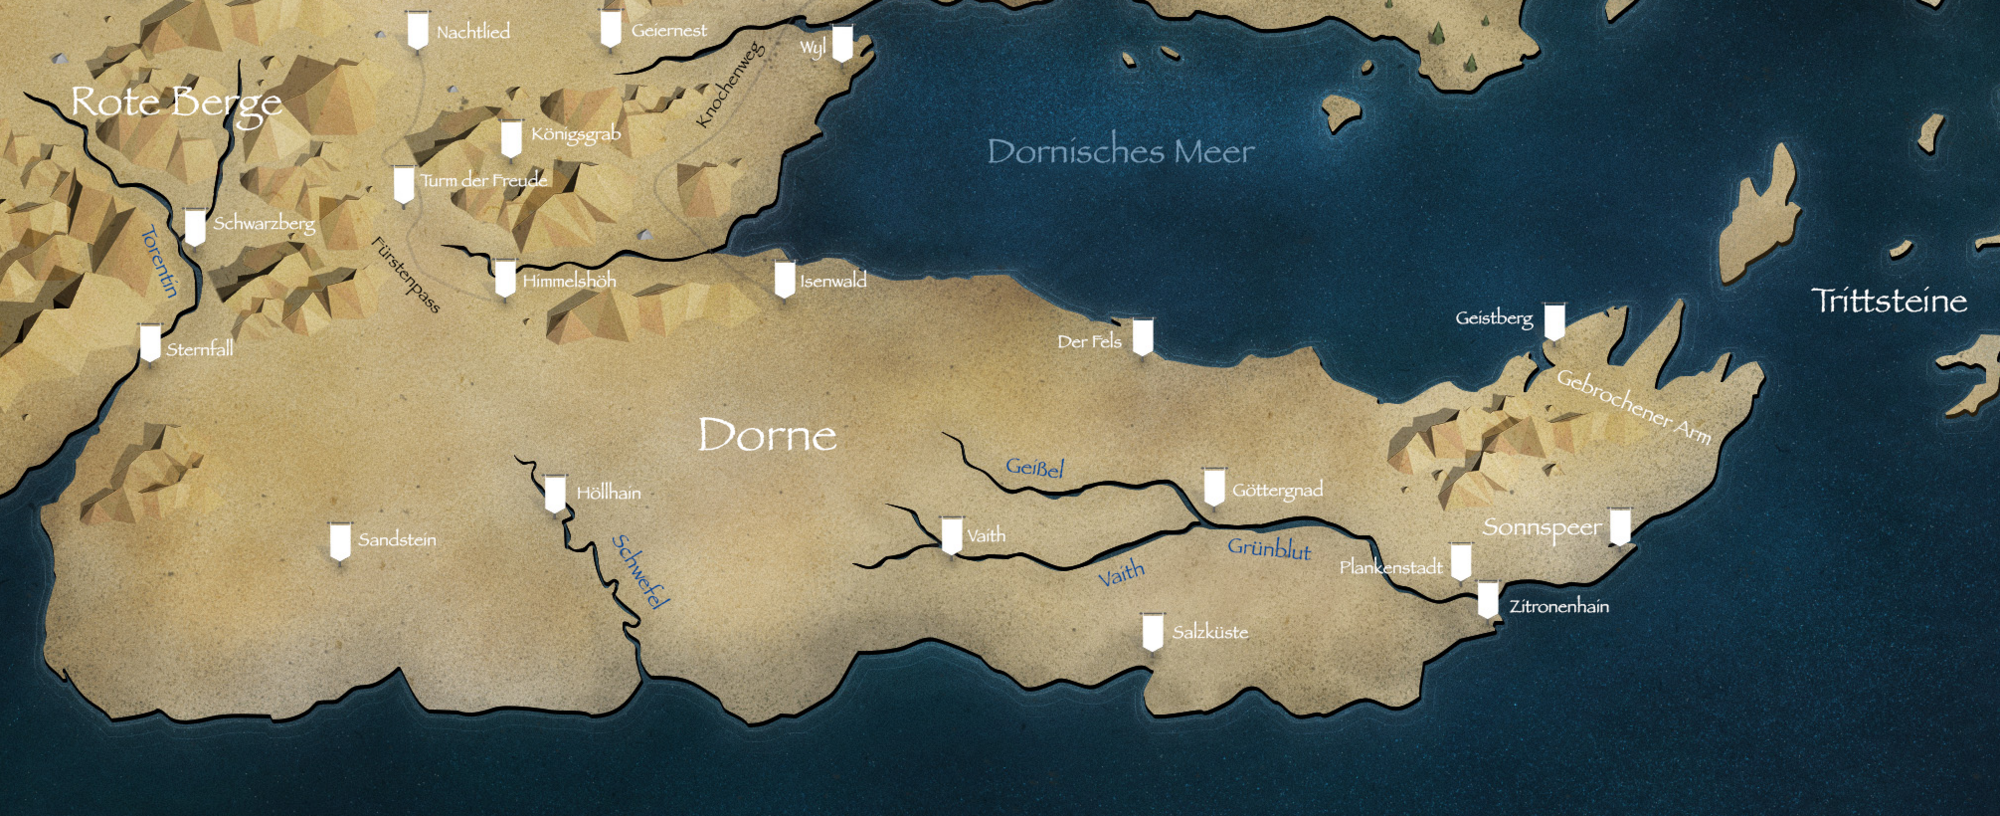 Got Karte.Dorne Game Of Thrones Wiki Fandom Powered By Wikia